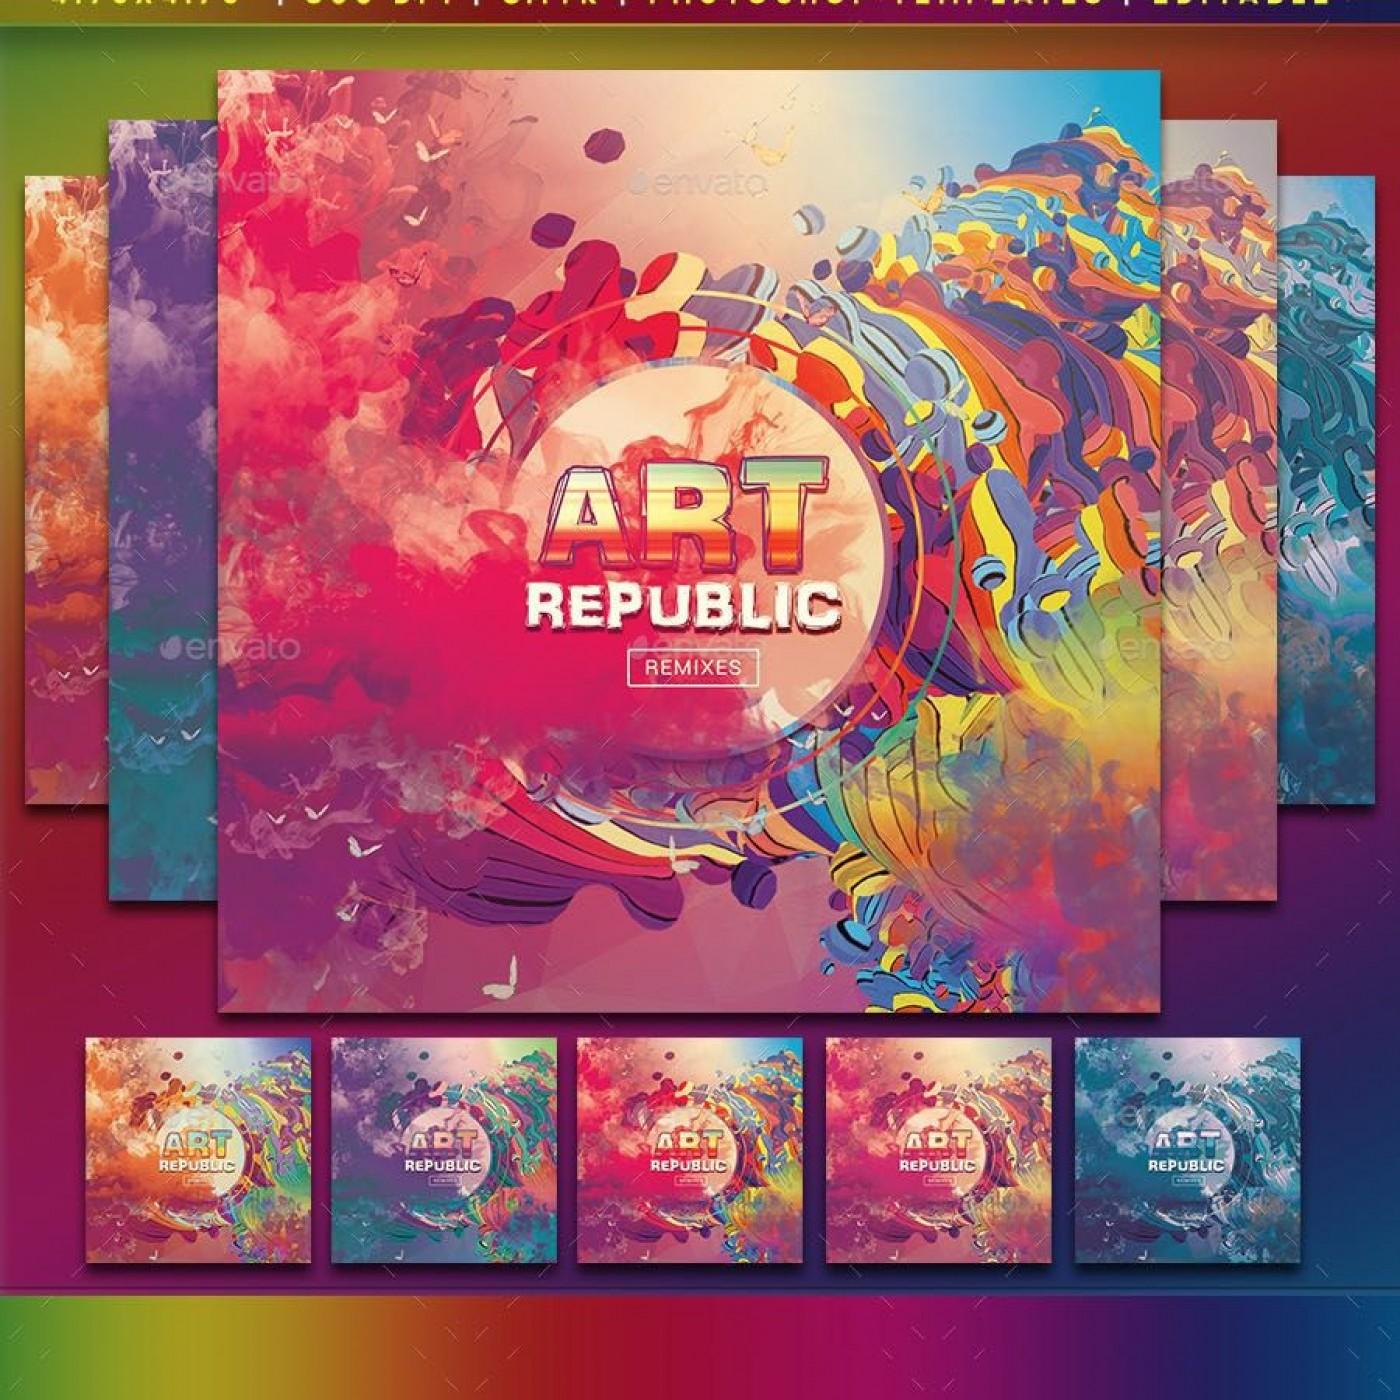 001 Sensational Music Cd Cover Design Template Free Download Inspiration 1400